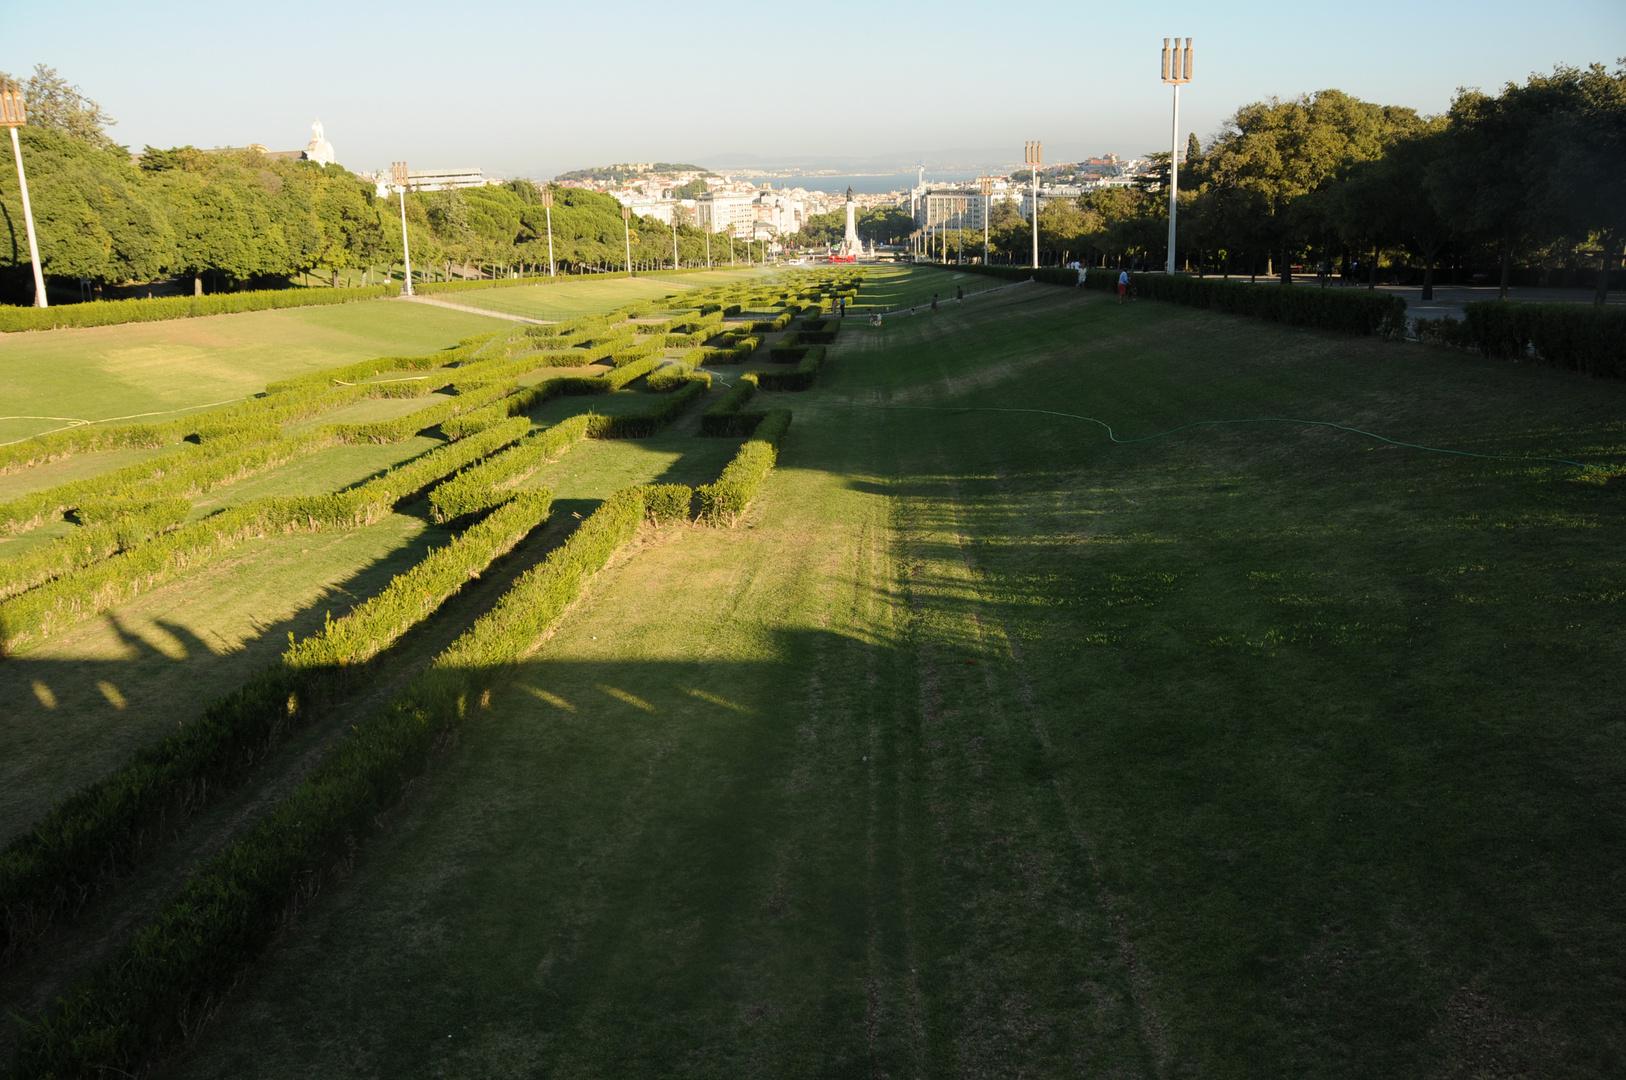 Lisboa - Av. Liberdade